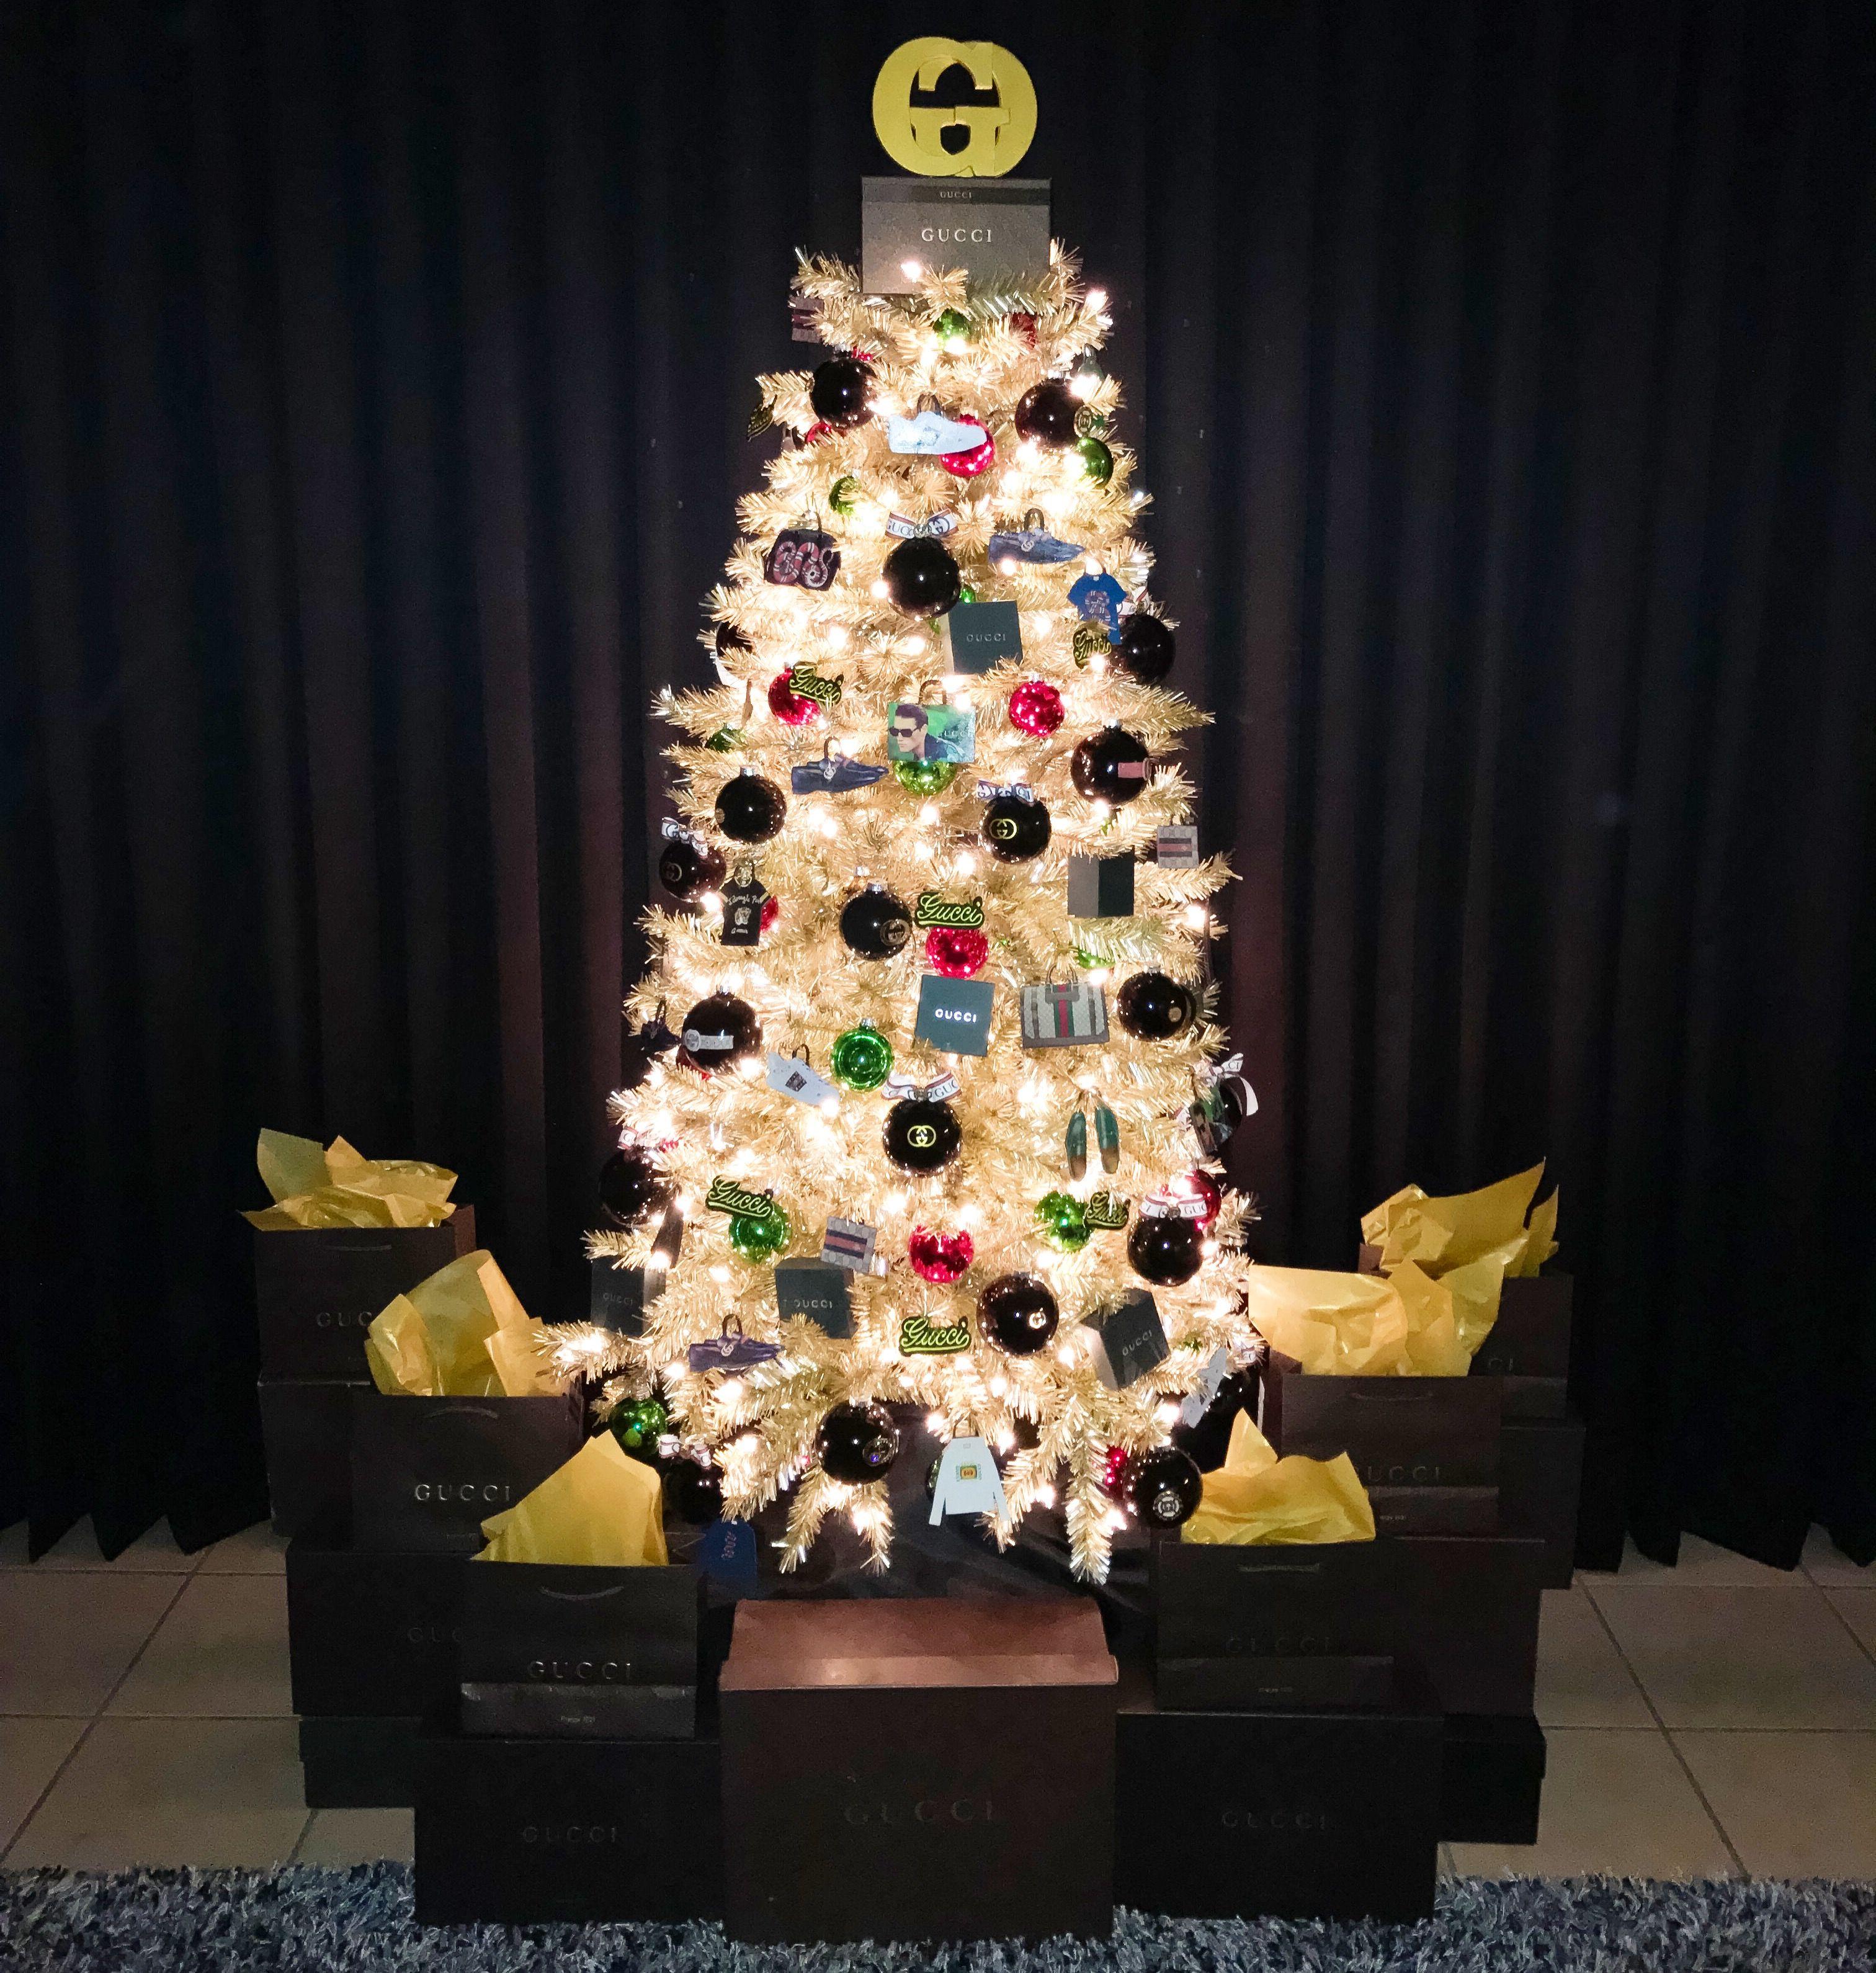 Mccoys Christmas Trees: Gucci Christmas Tree. Designer Luxury Christmas I Created